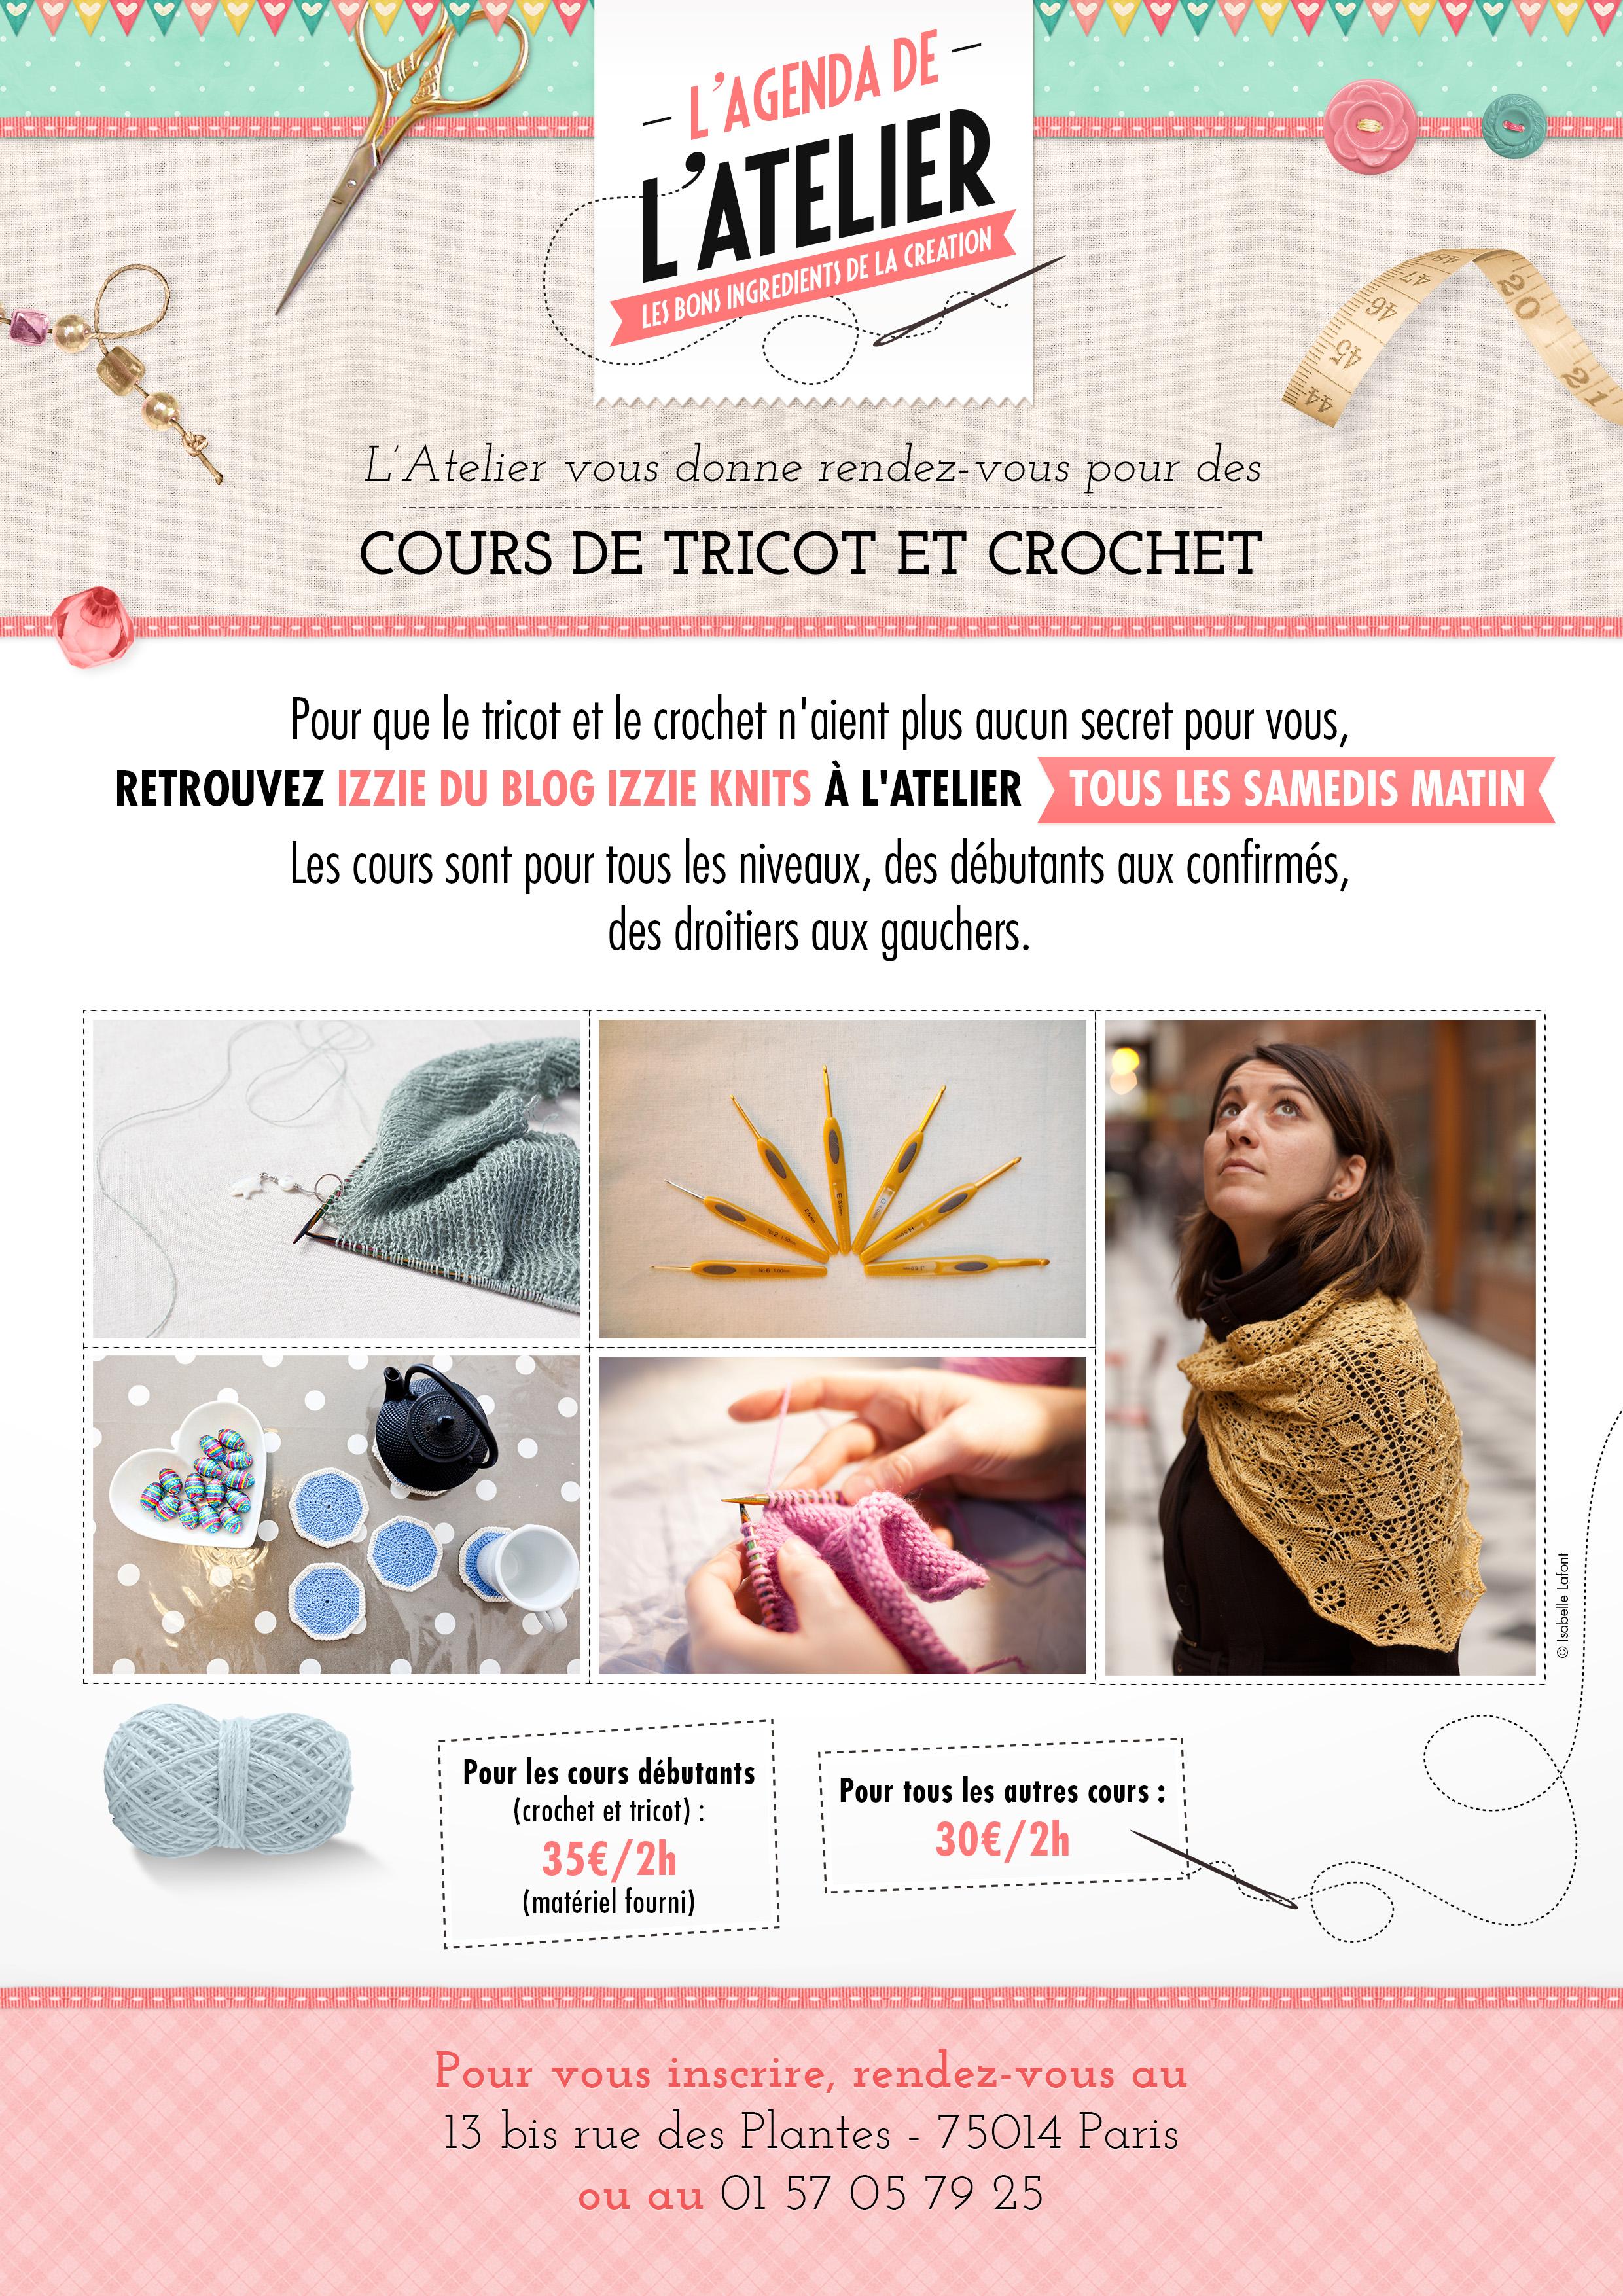 Agenda Cours-Tricot-2013-09-09